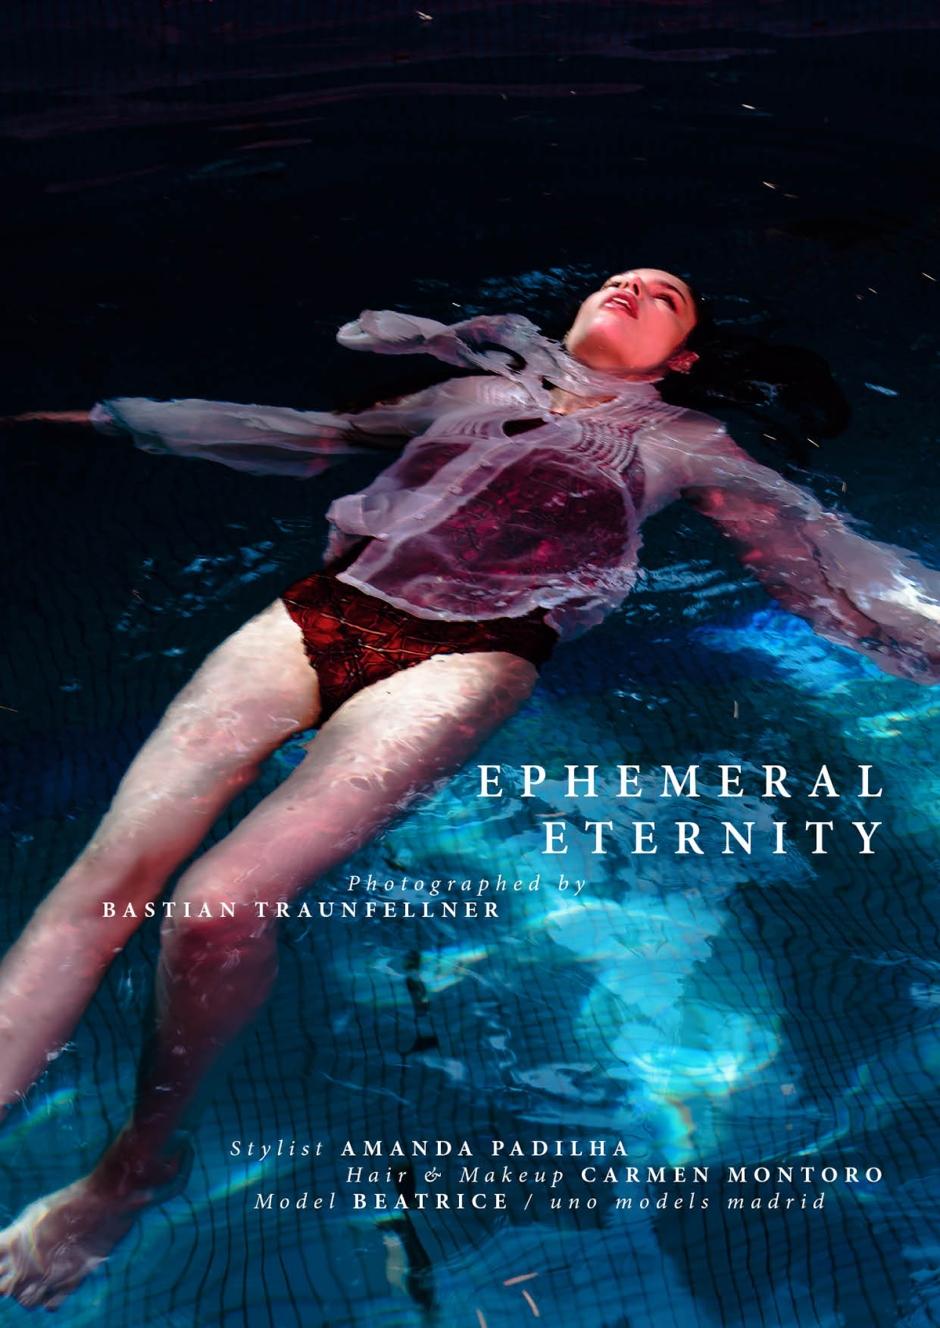 Ephemeral Eternity